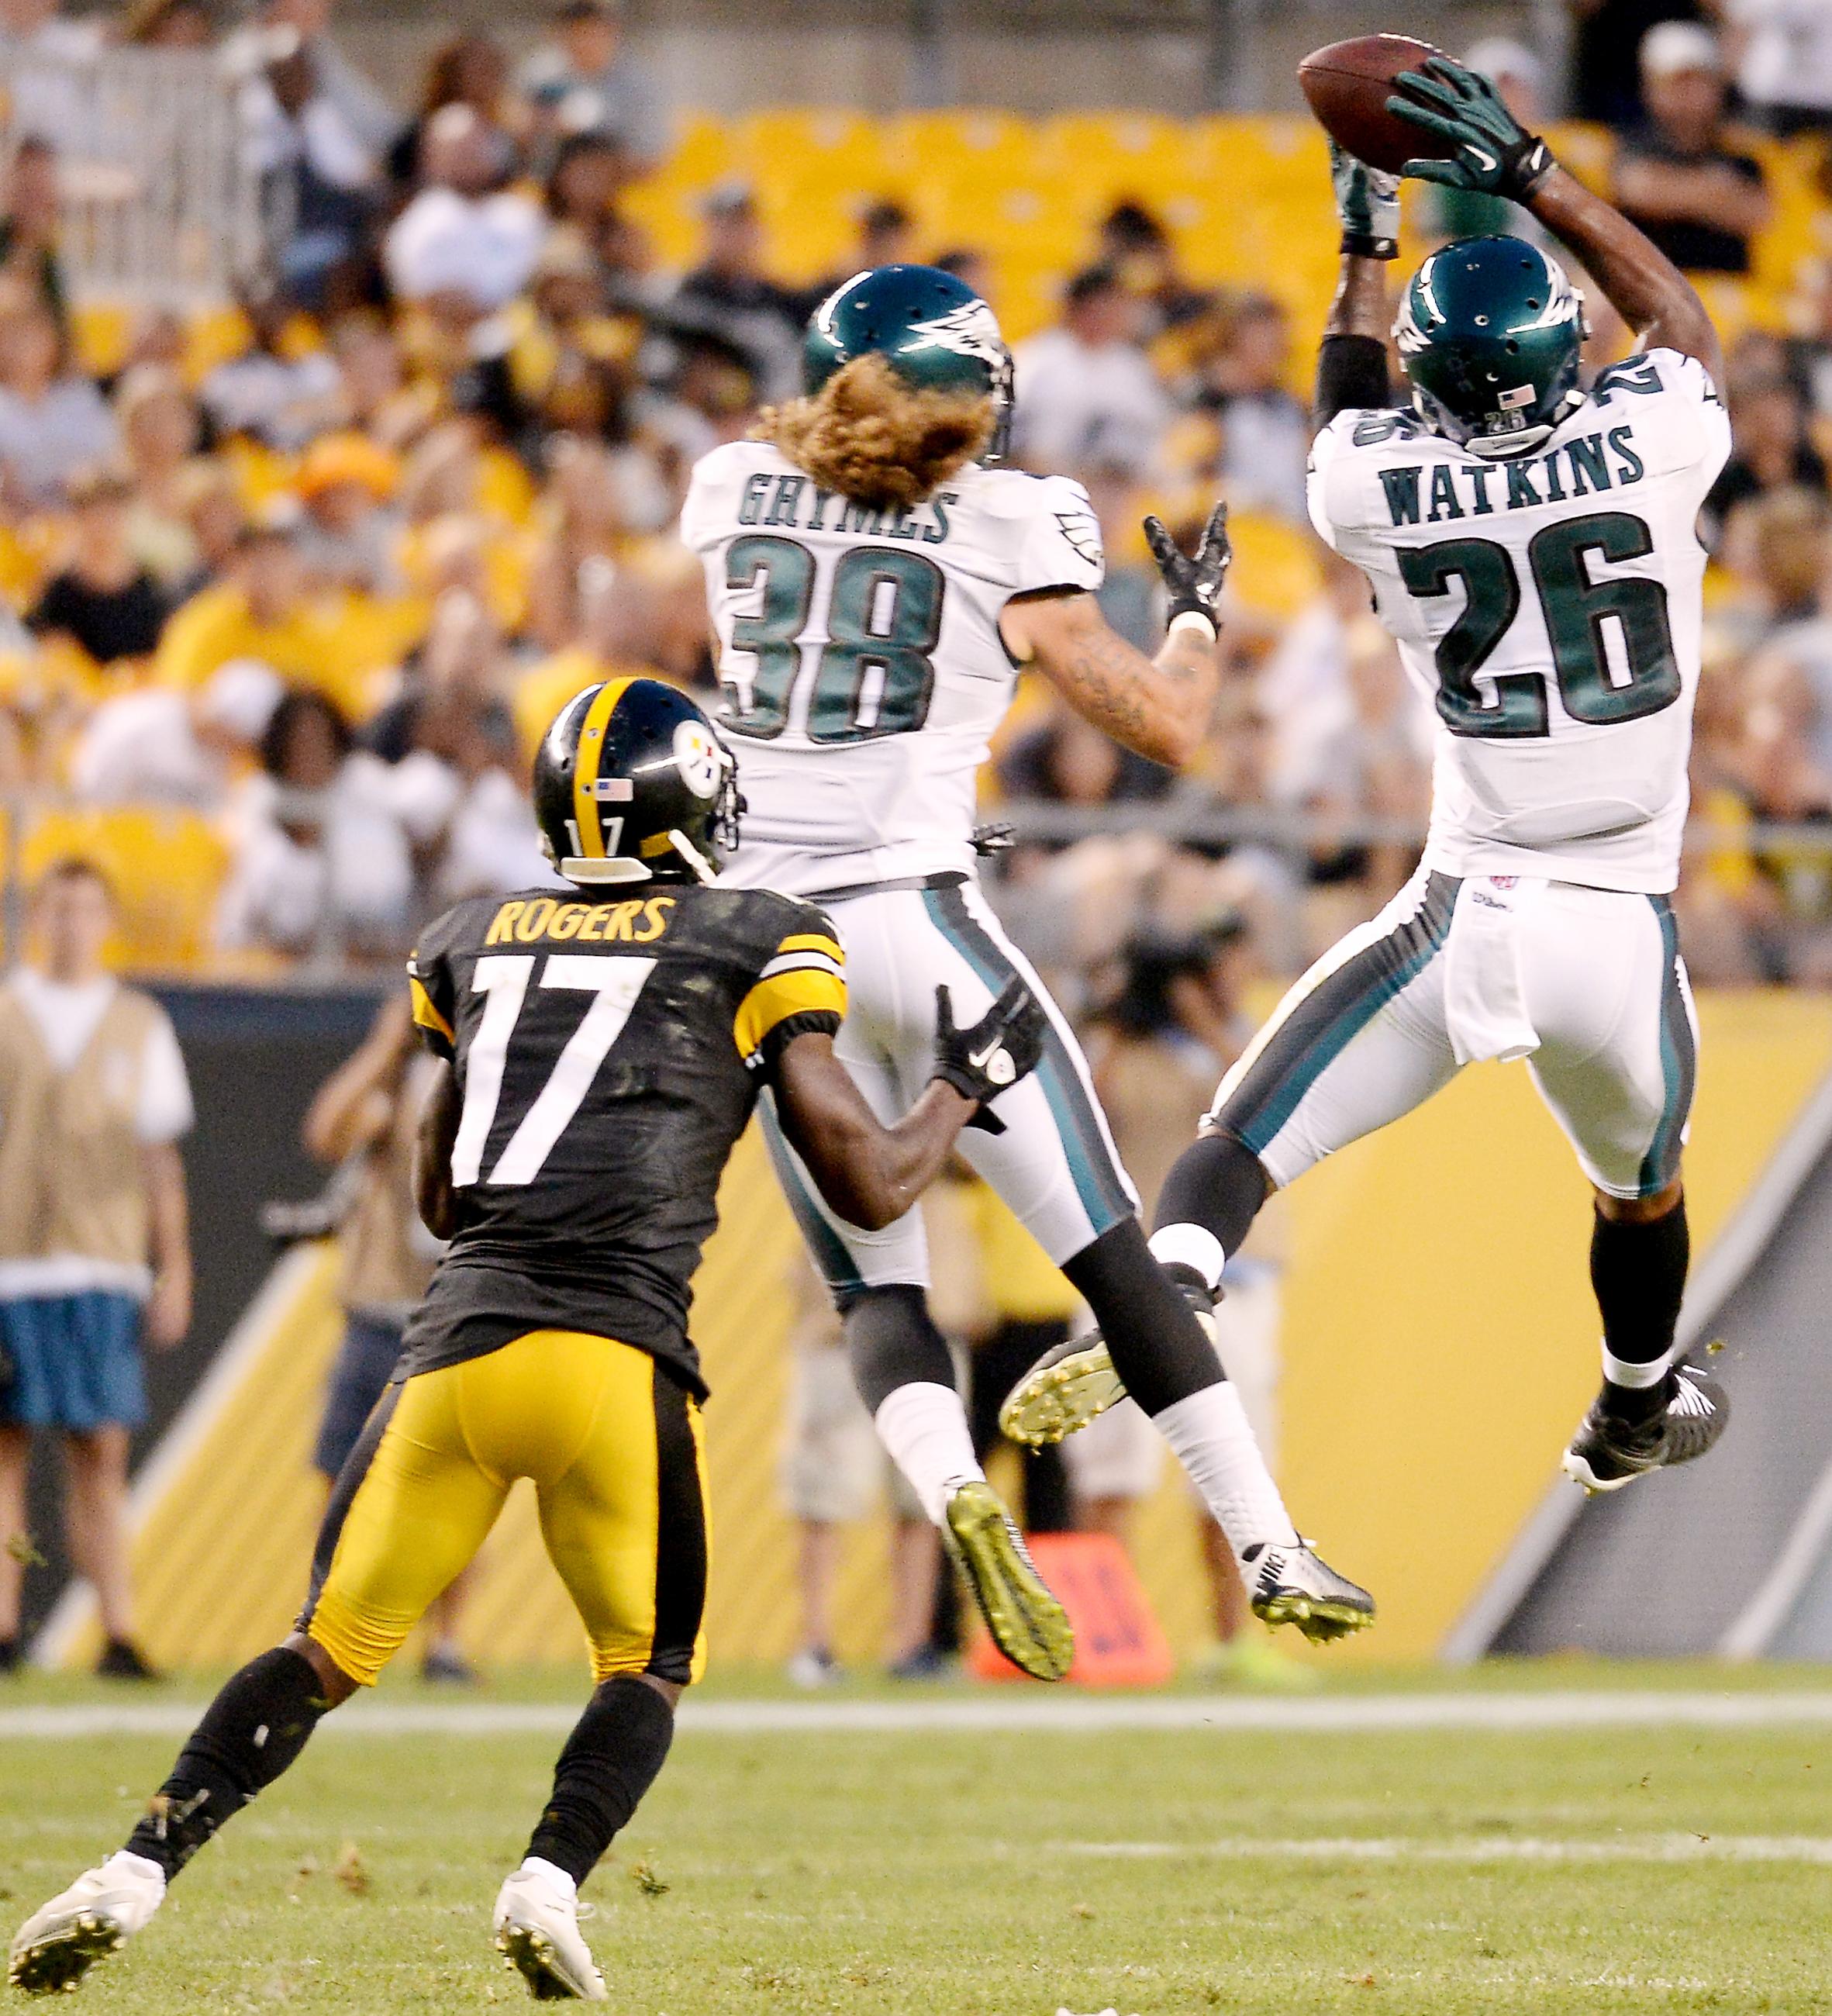 Eagles' Jaylen Watkins intercepts a ball intended for Steelers' Eli Rogers in the second quarter Thursday at Heinz Field. (Matt Freed/Post-Gazette)